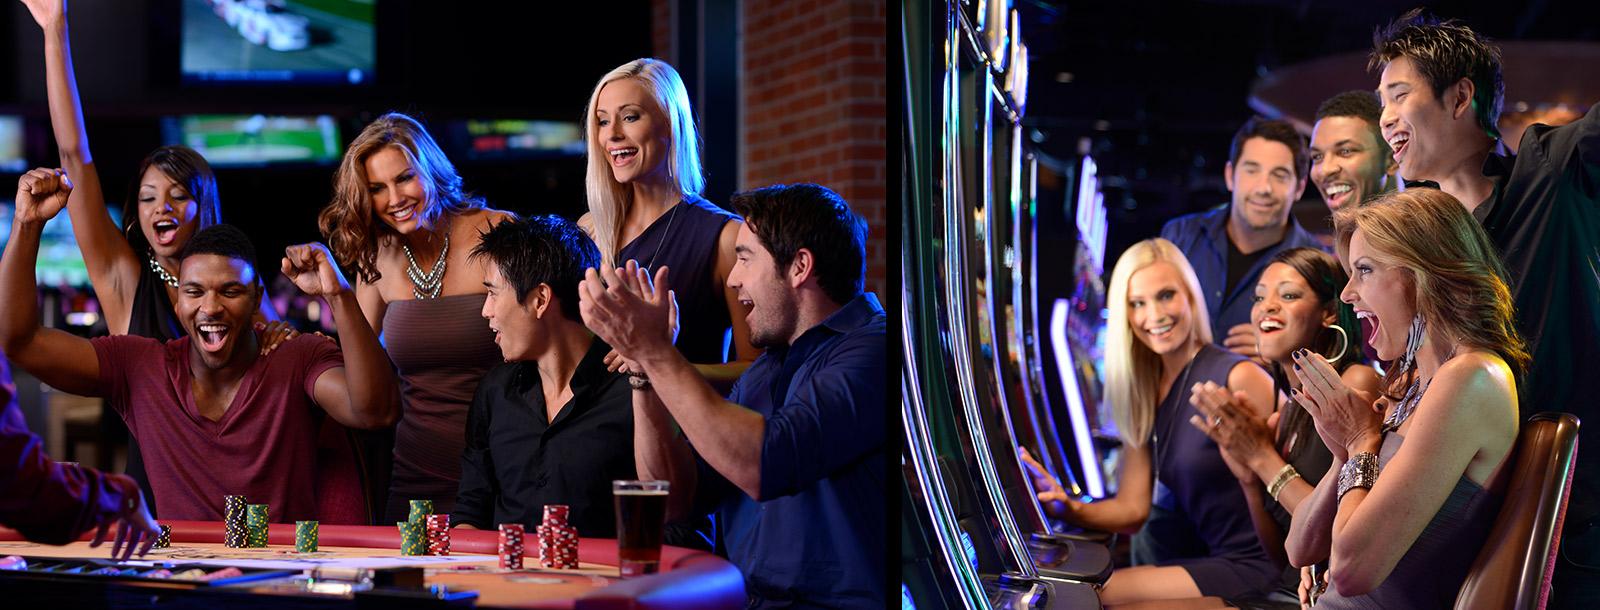 casinos in sioux city iowa